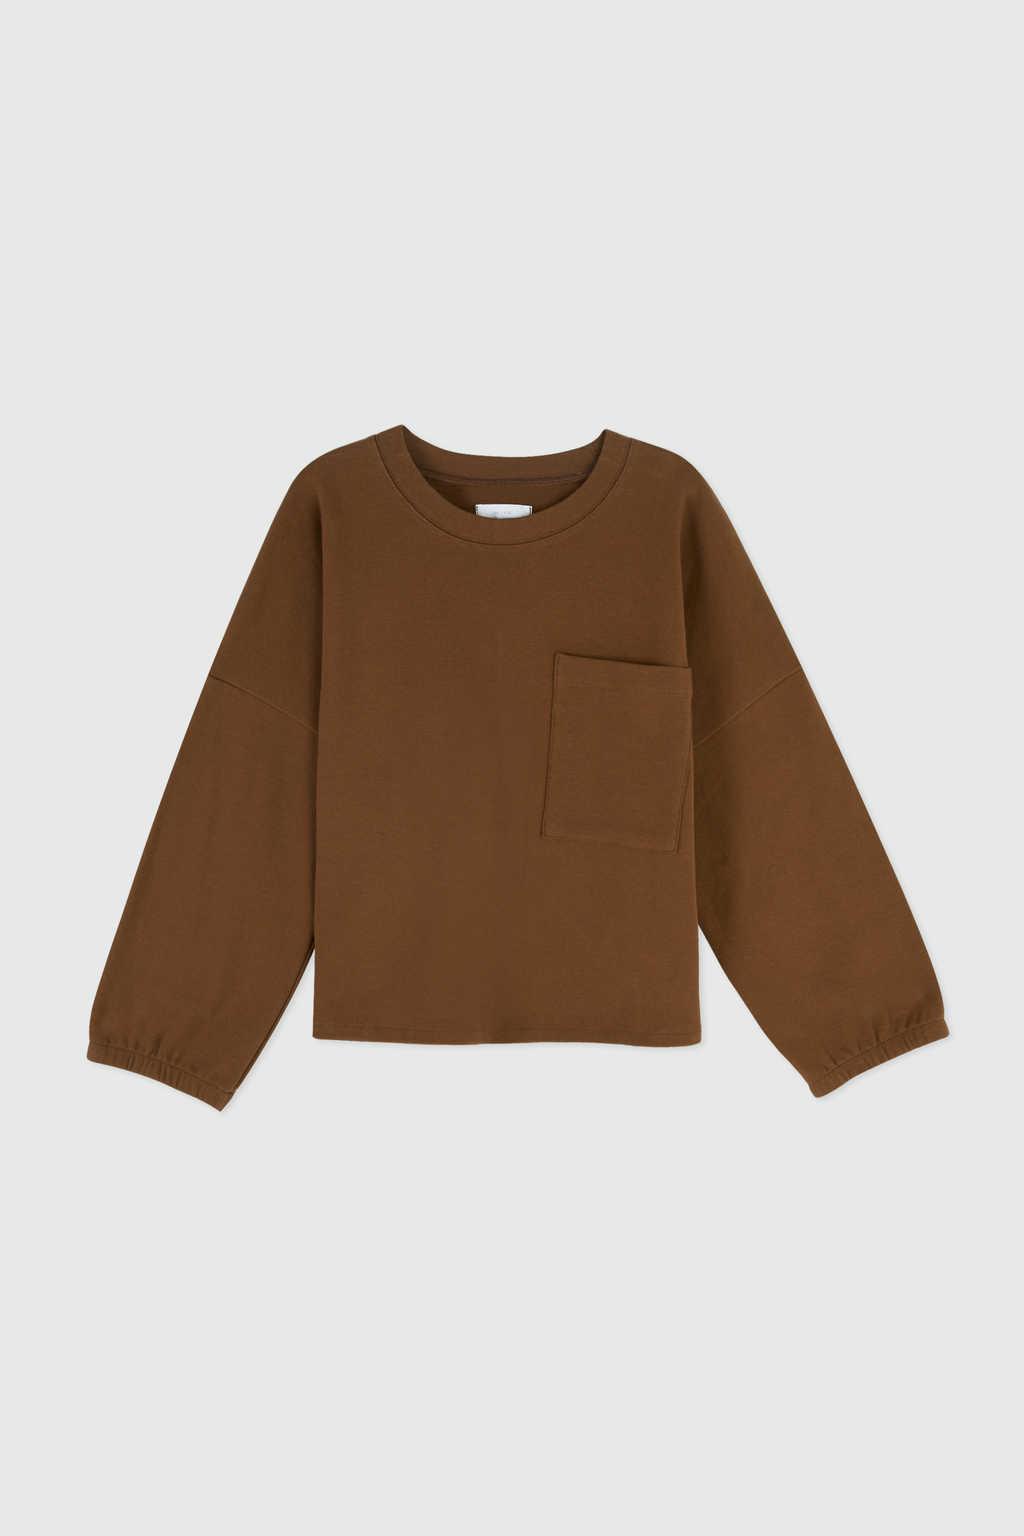 Sweatshirt 2968 Camel 6